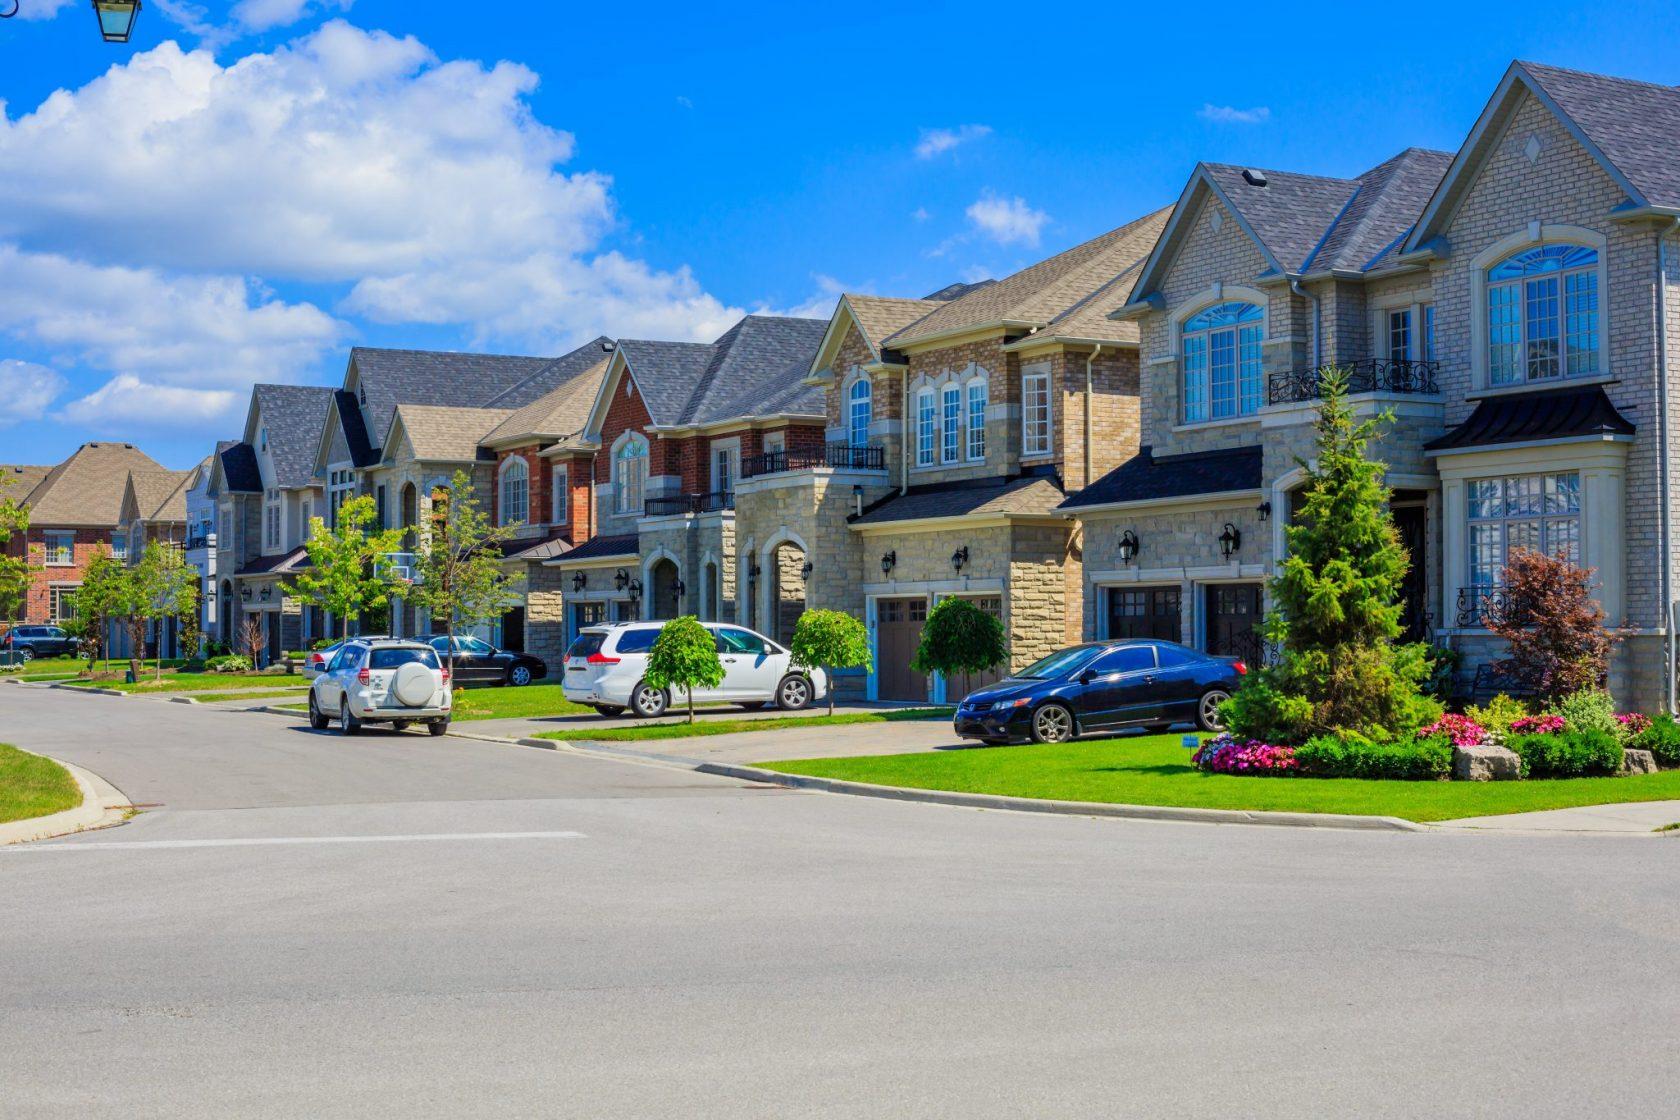 burlington-real-estate-neighbourhood-burlington-homes-for-sale-team-logue